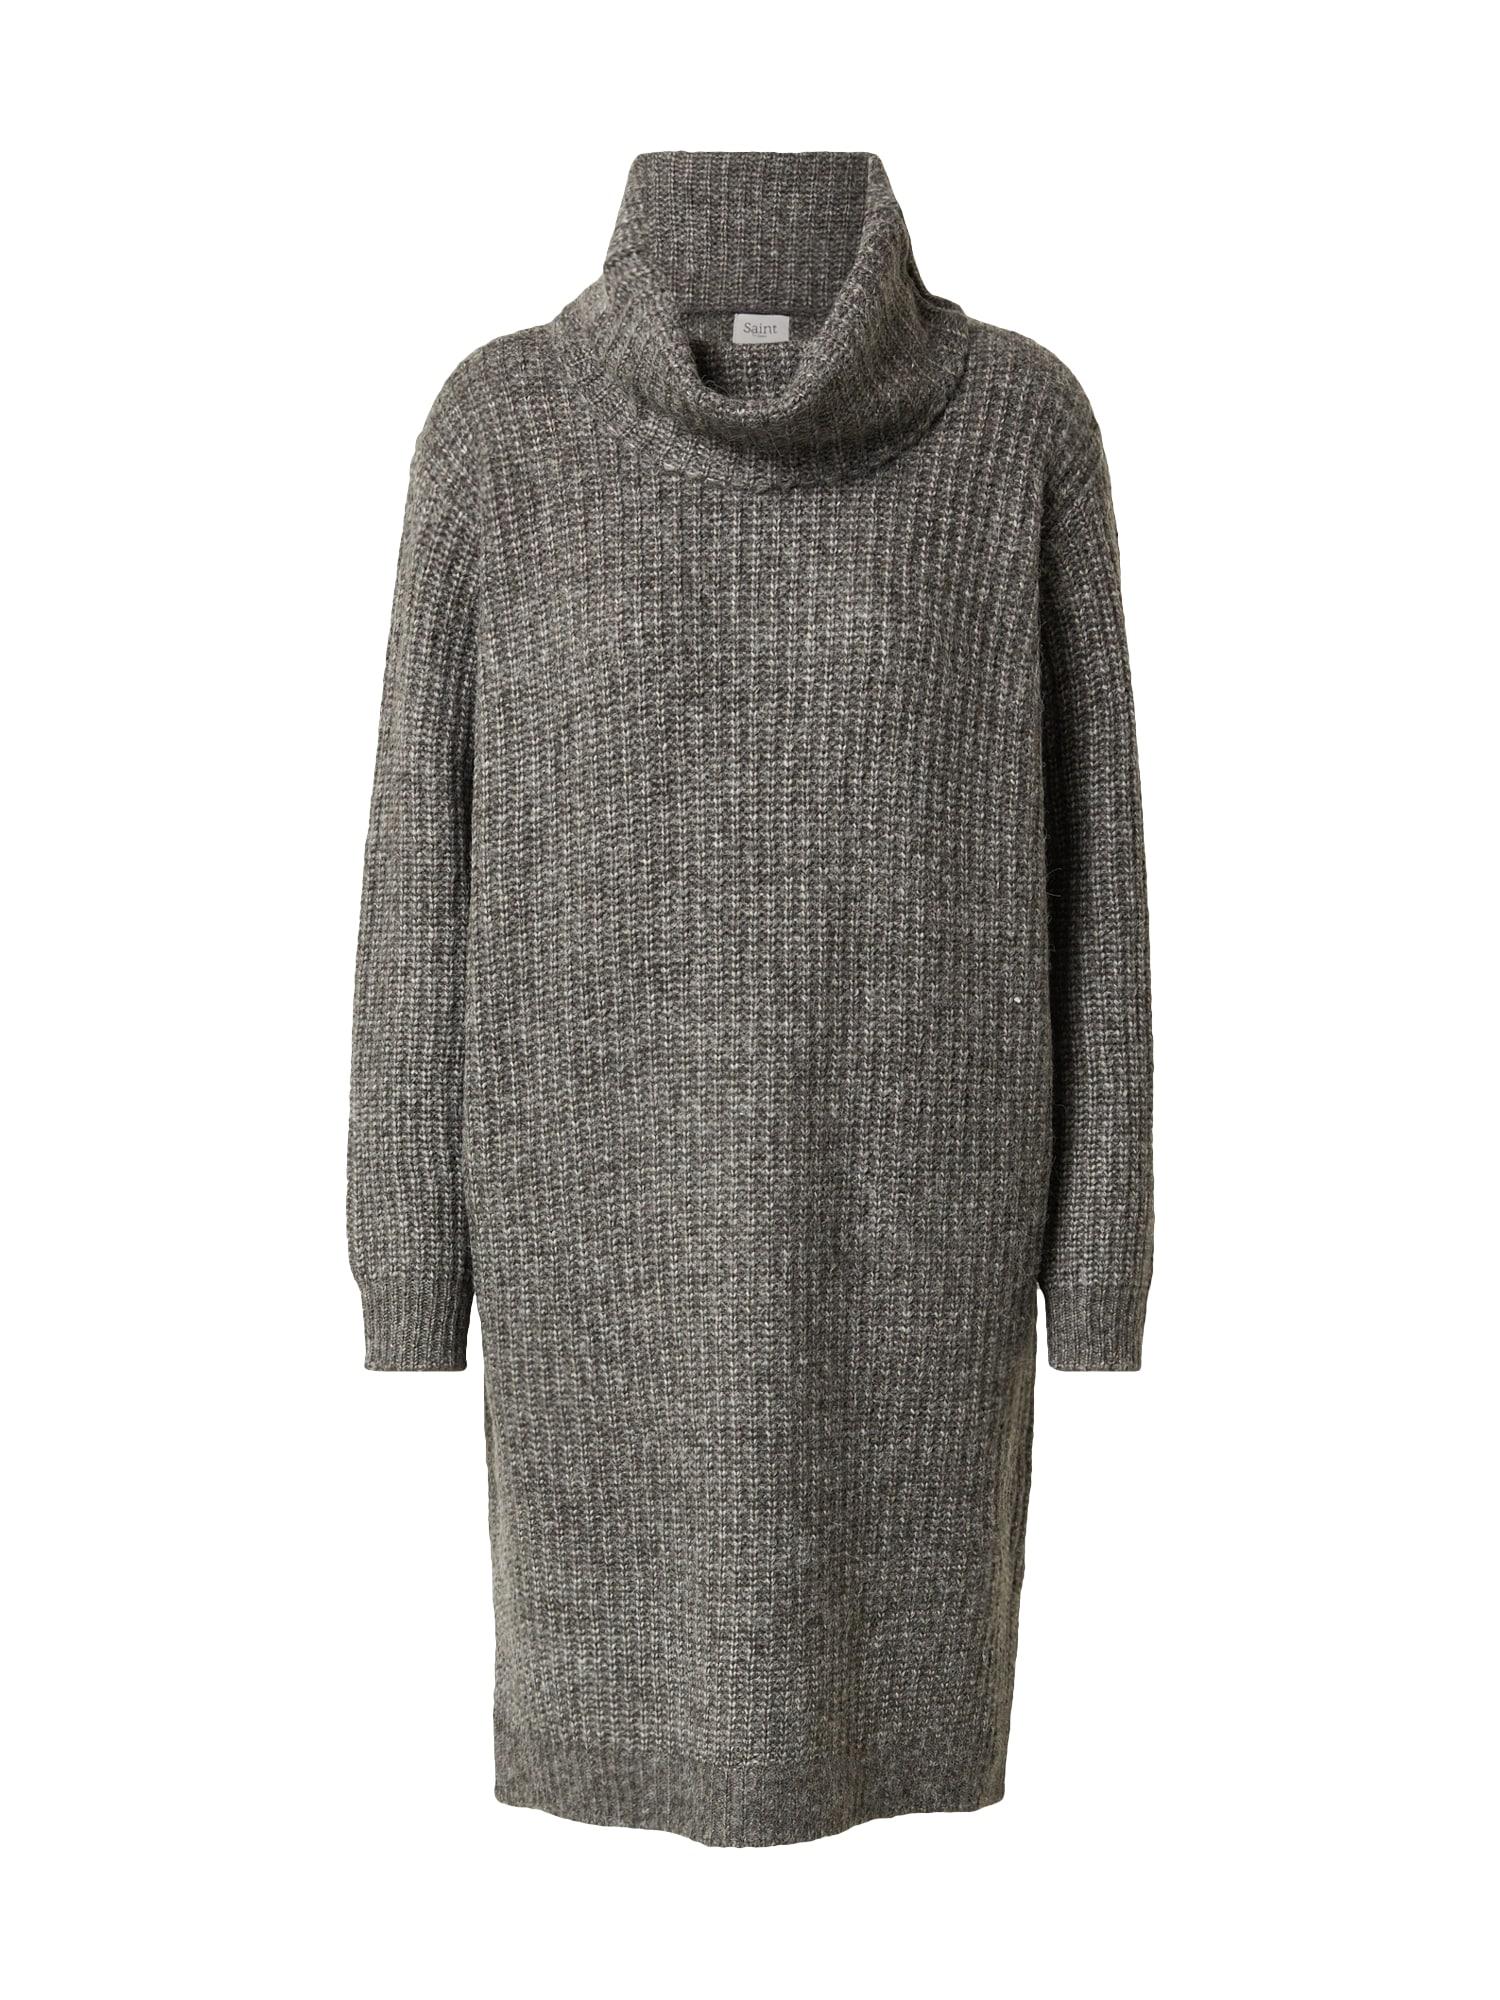 SAINT TROPEZ Úpletové šaty 'Ivonna'  šedý melír